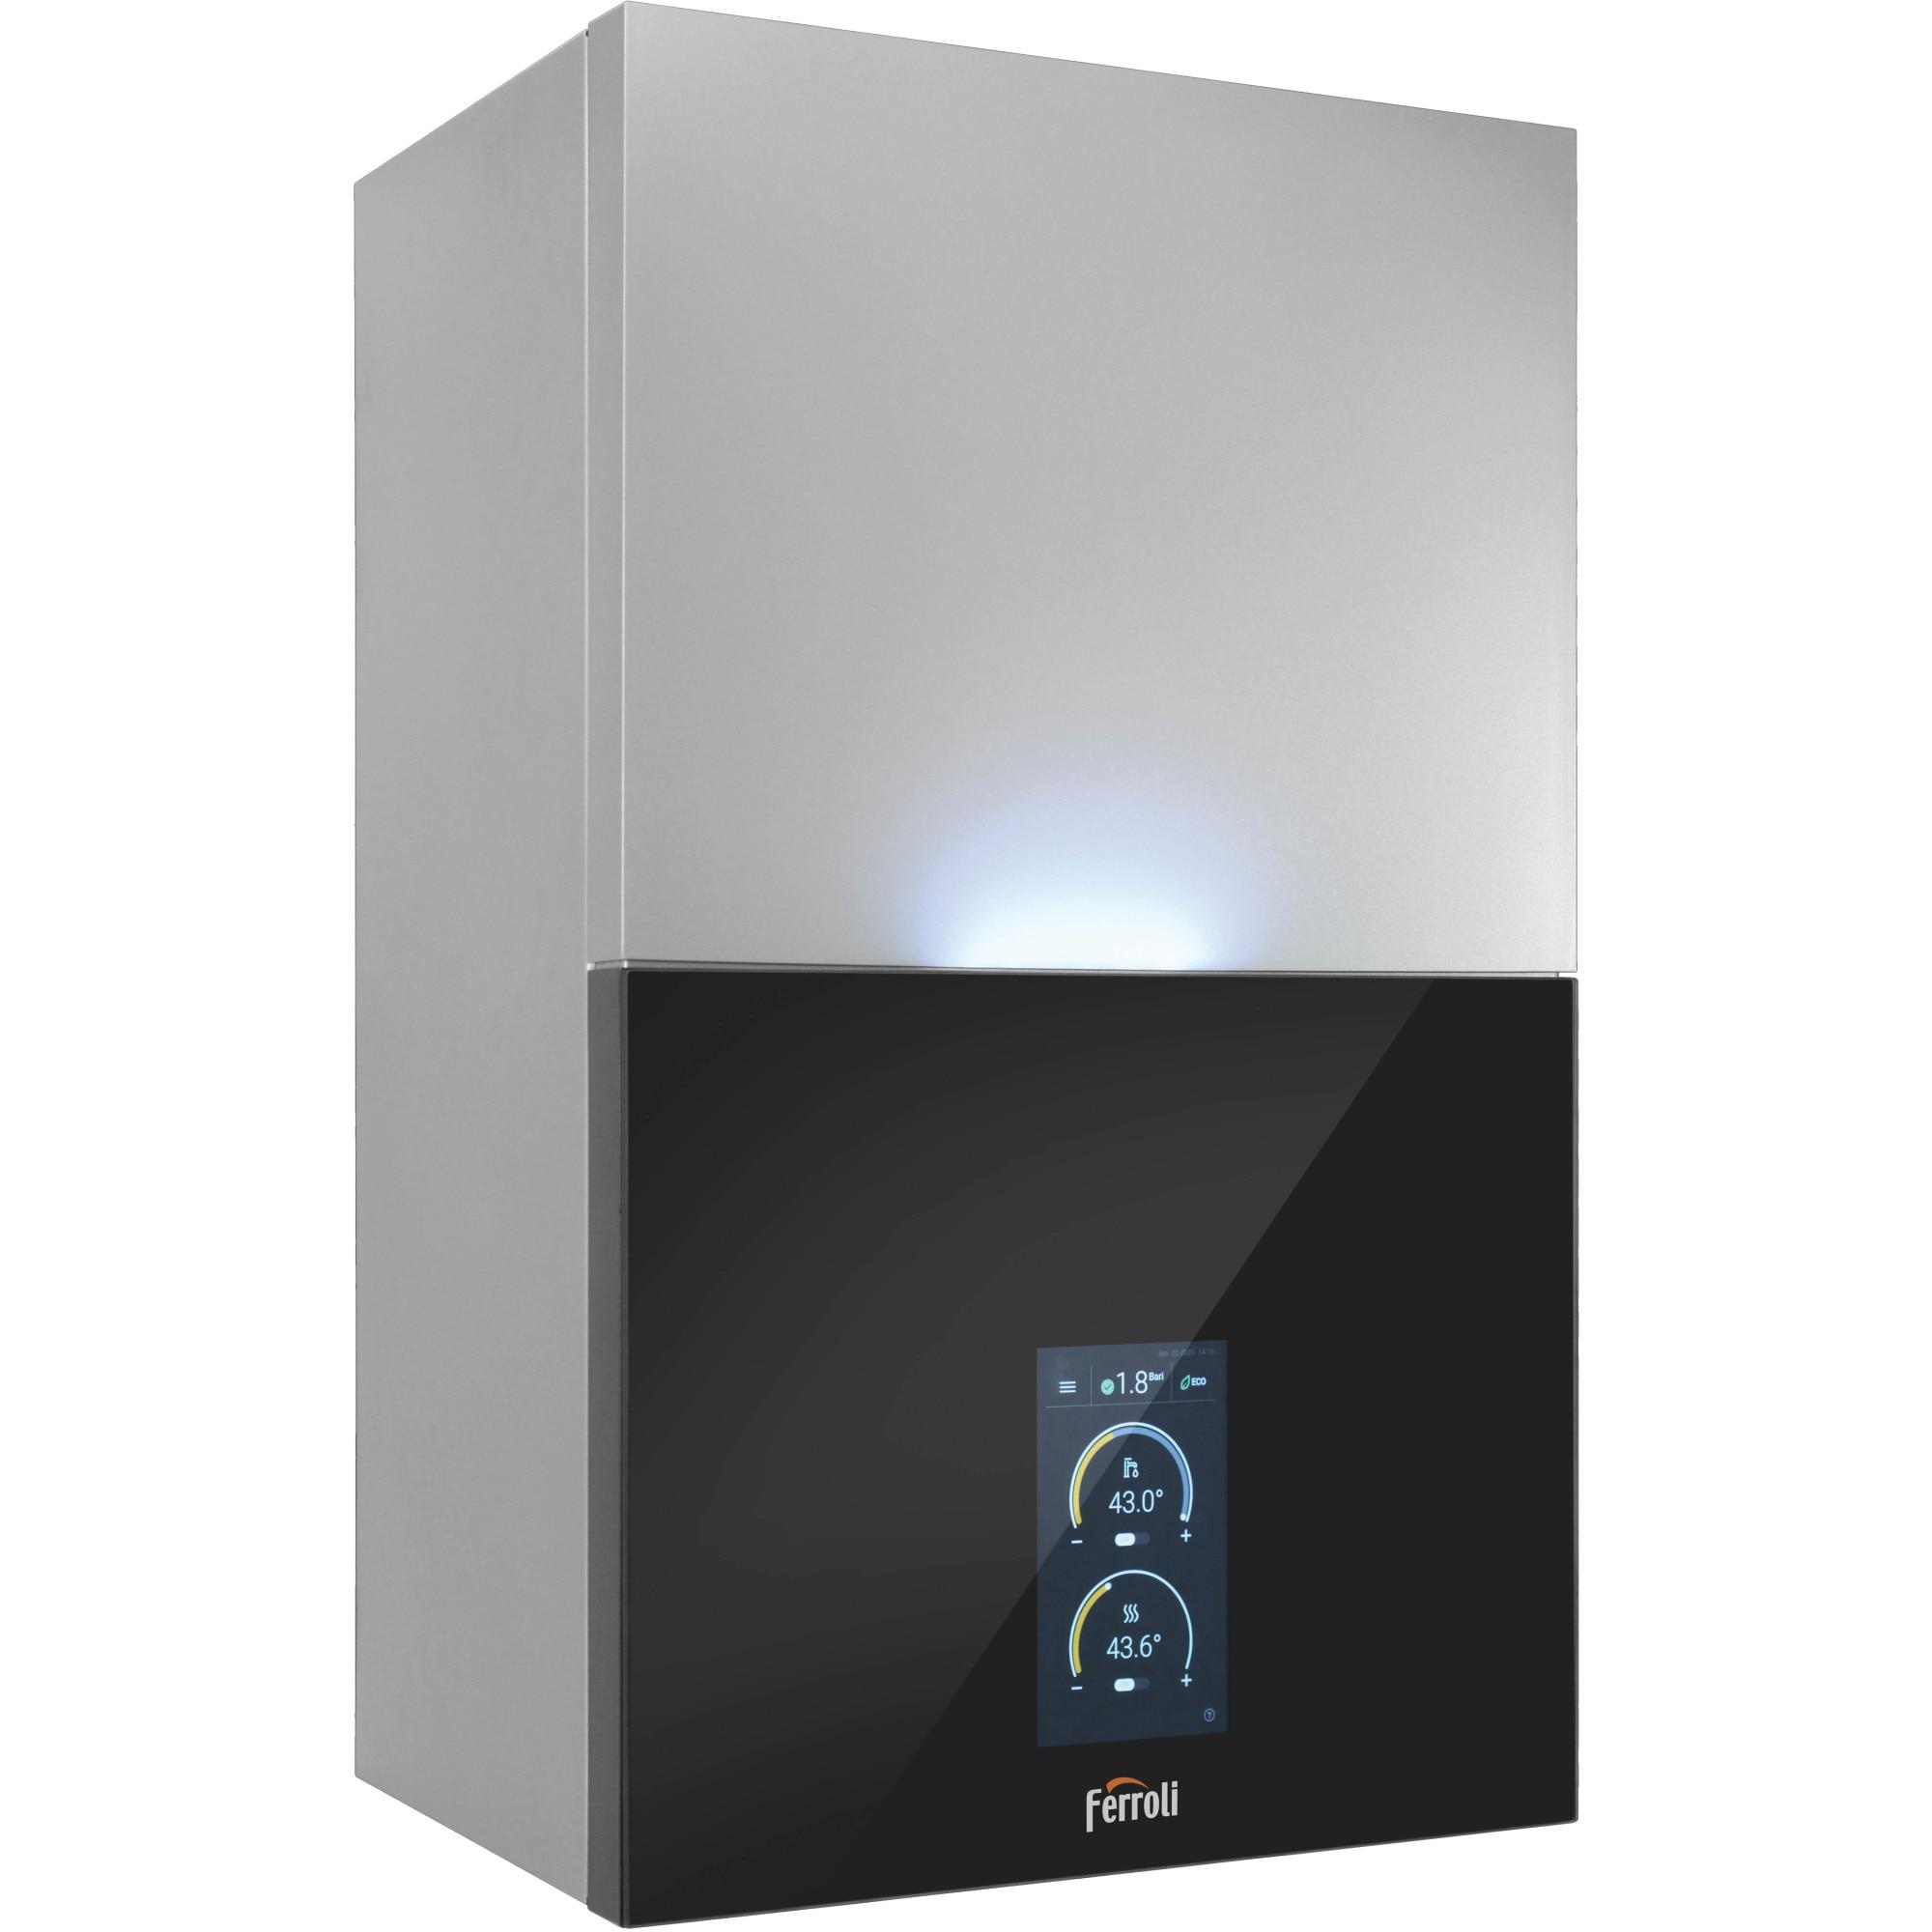 "Fotografie Centrala termica in condensare Ferroli Bluehelix MAXIMA 28C, 28 kW, , touch screen 7"", sistem de combustie autoadaptiv, fara kit evacuare"